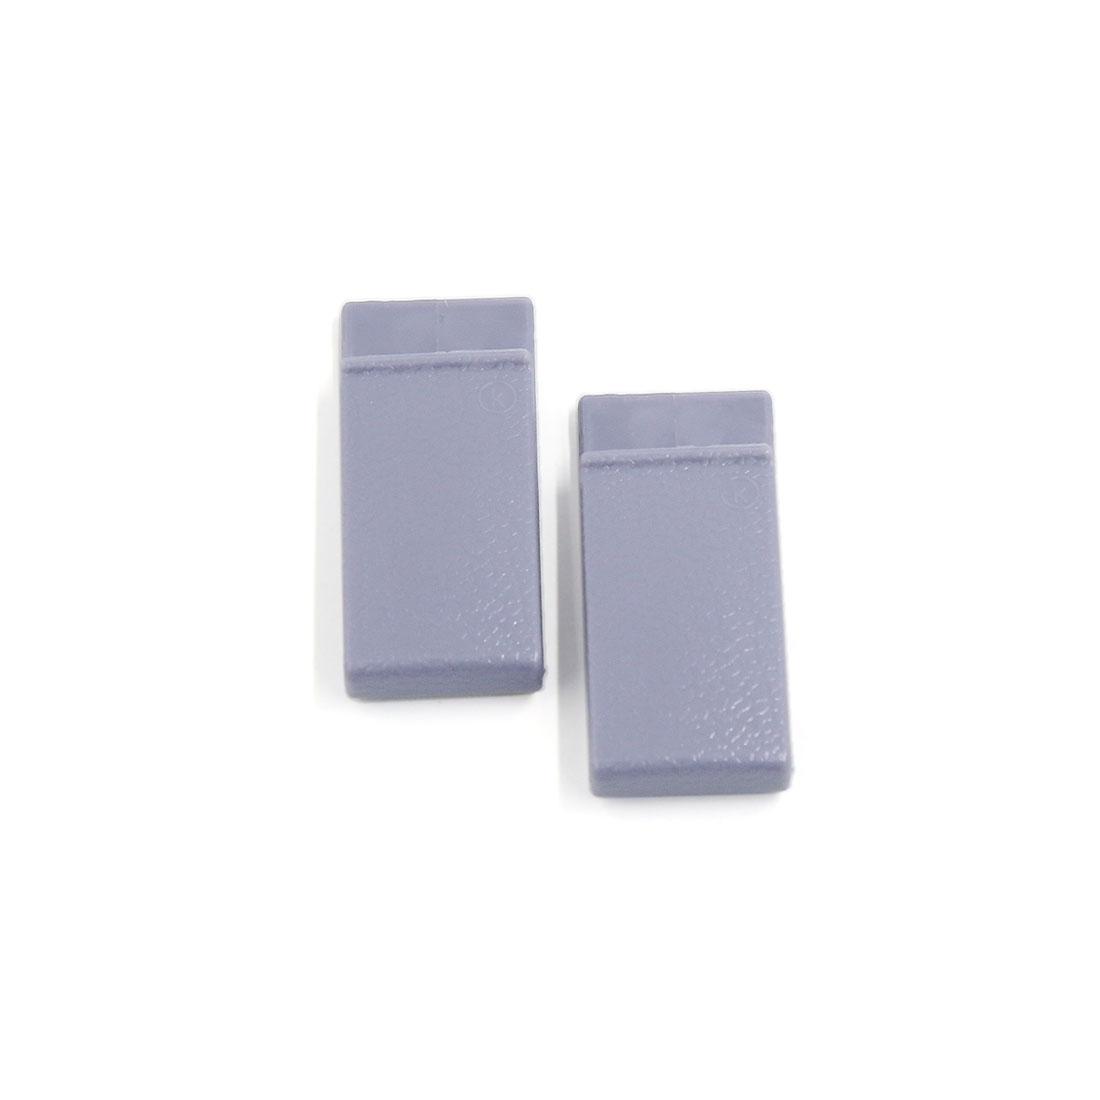 Light Purple Card Bill Ticket Holder Car Auto Visor Glasses Sunglasses Clip 2pcs